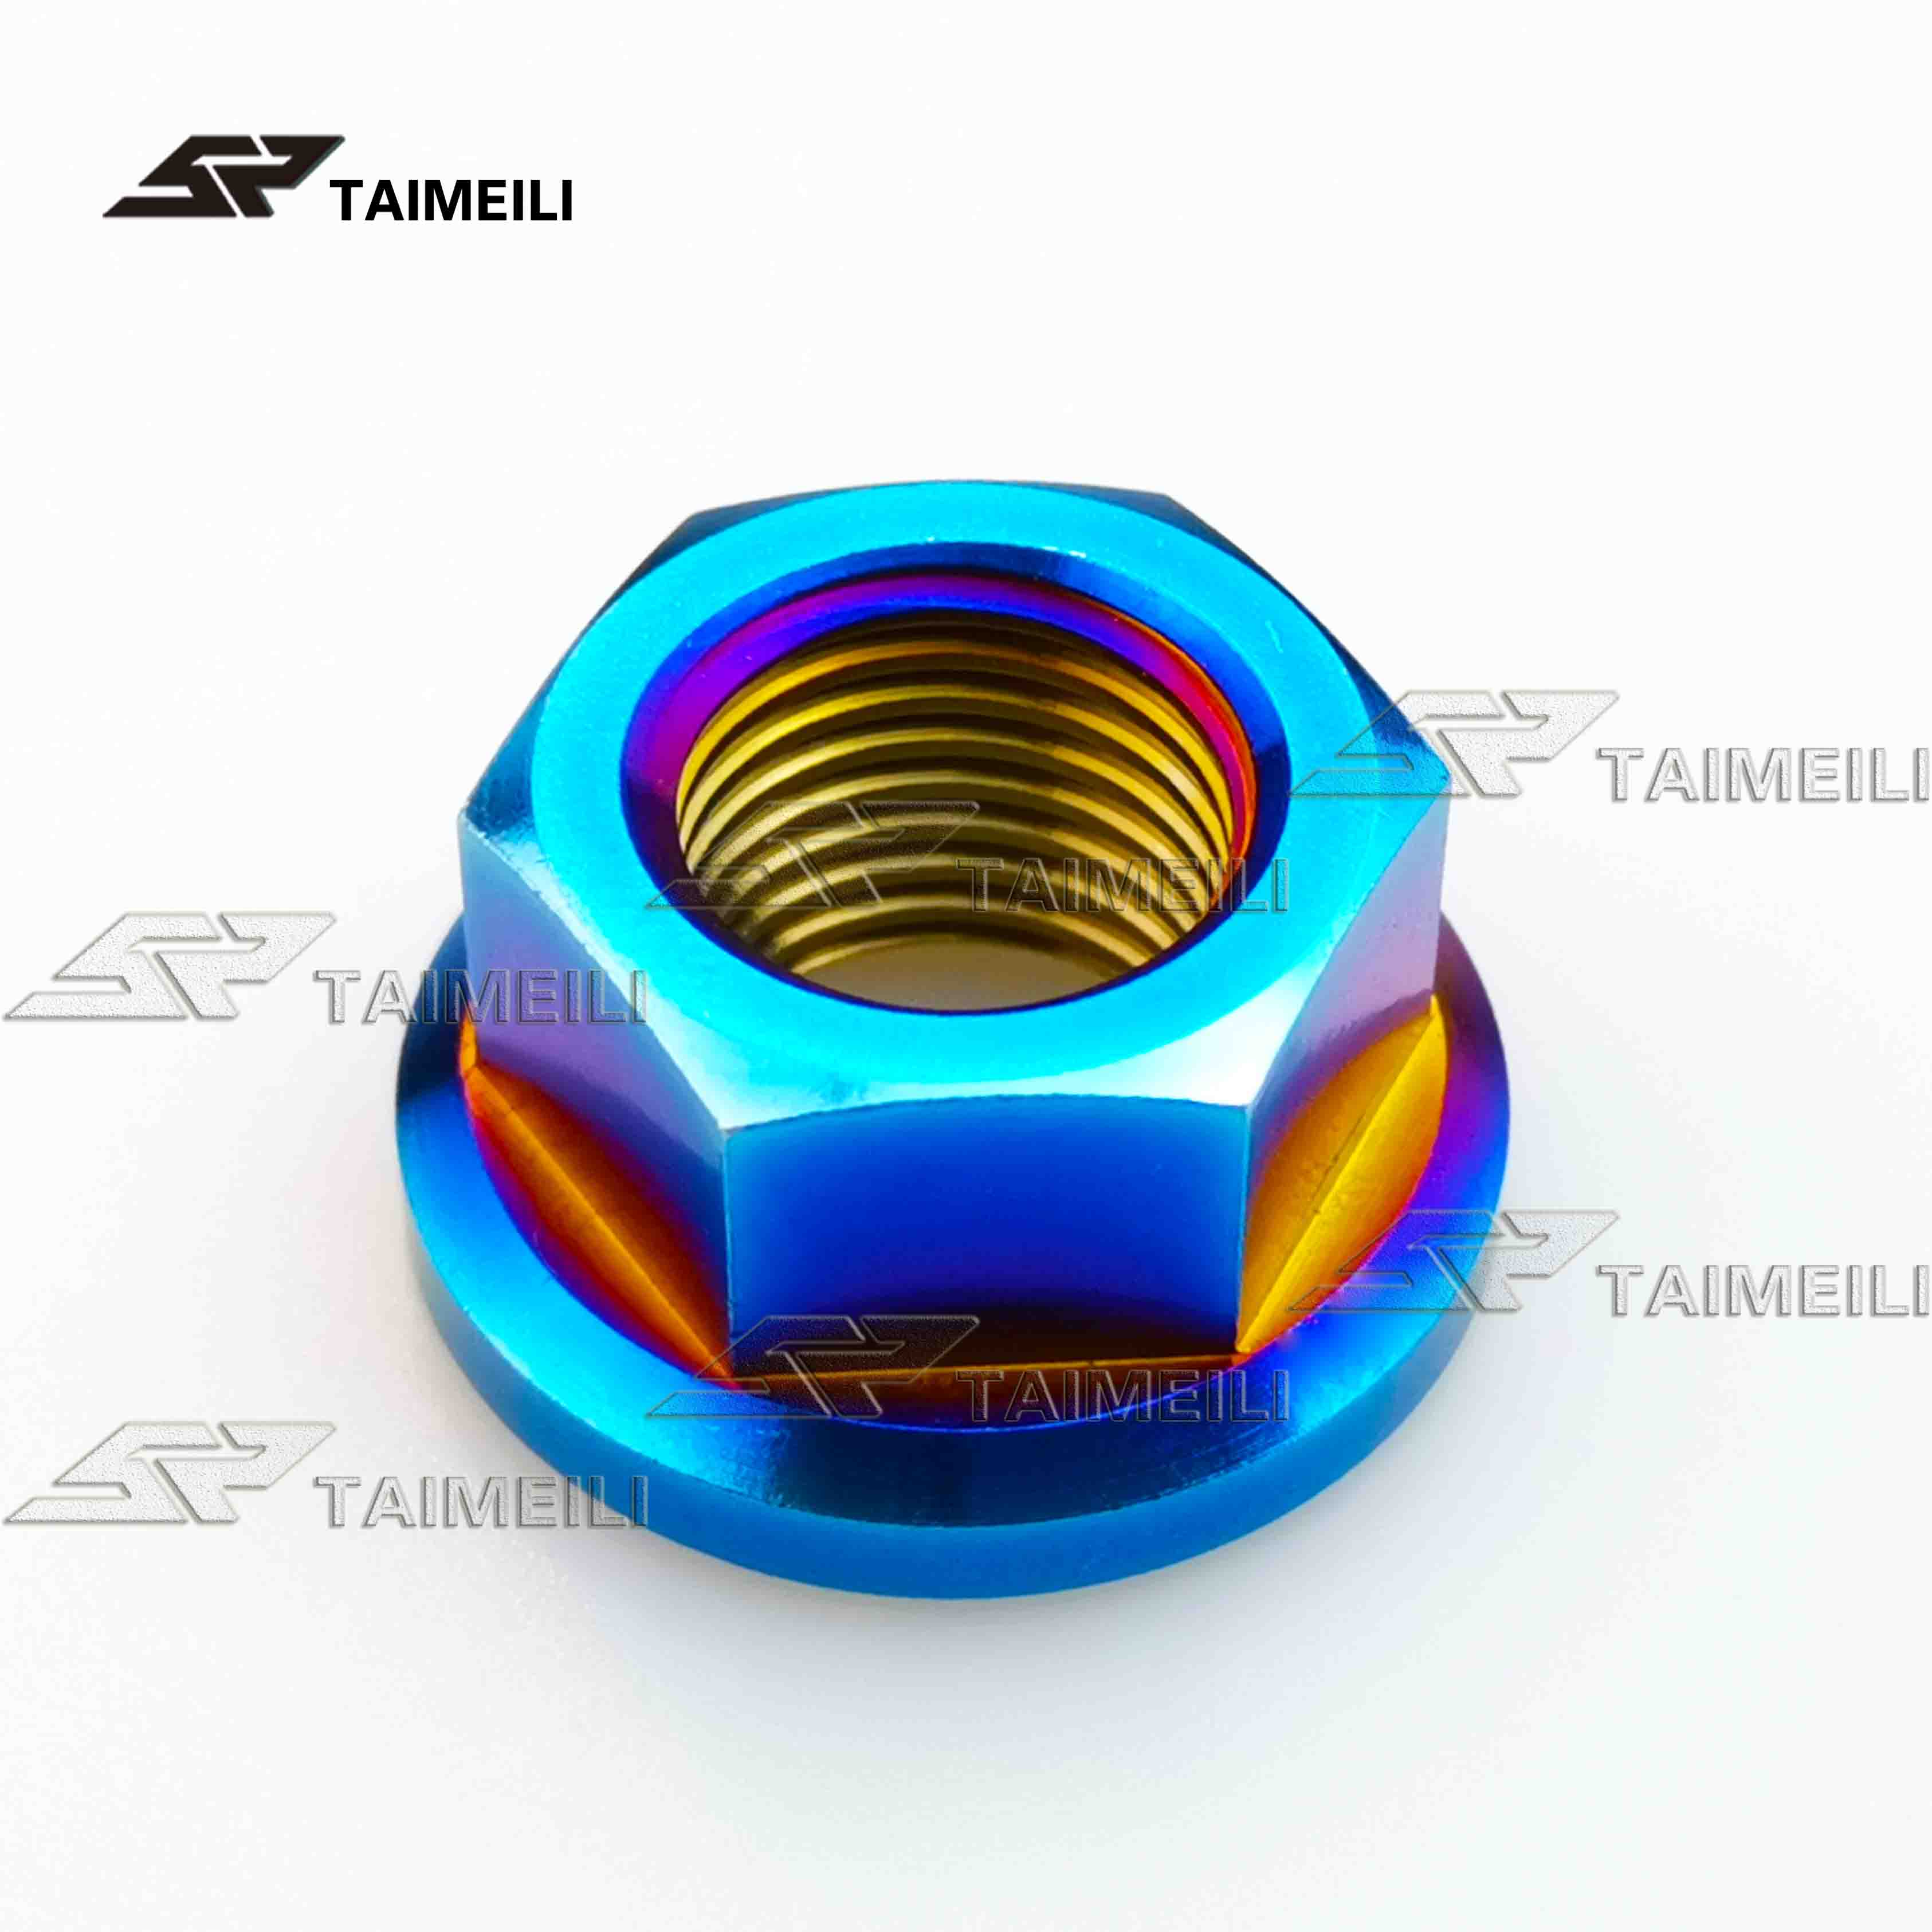 Titanium Ti Bolts M5 X 10 12 16 18 20 25 30 35 40 45 50 55 60Mm Allen Key Square Head Screw For Bicycle Stem Seatpost Gold M5 20mm